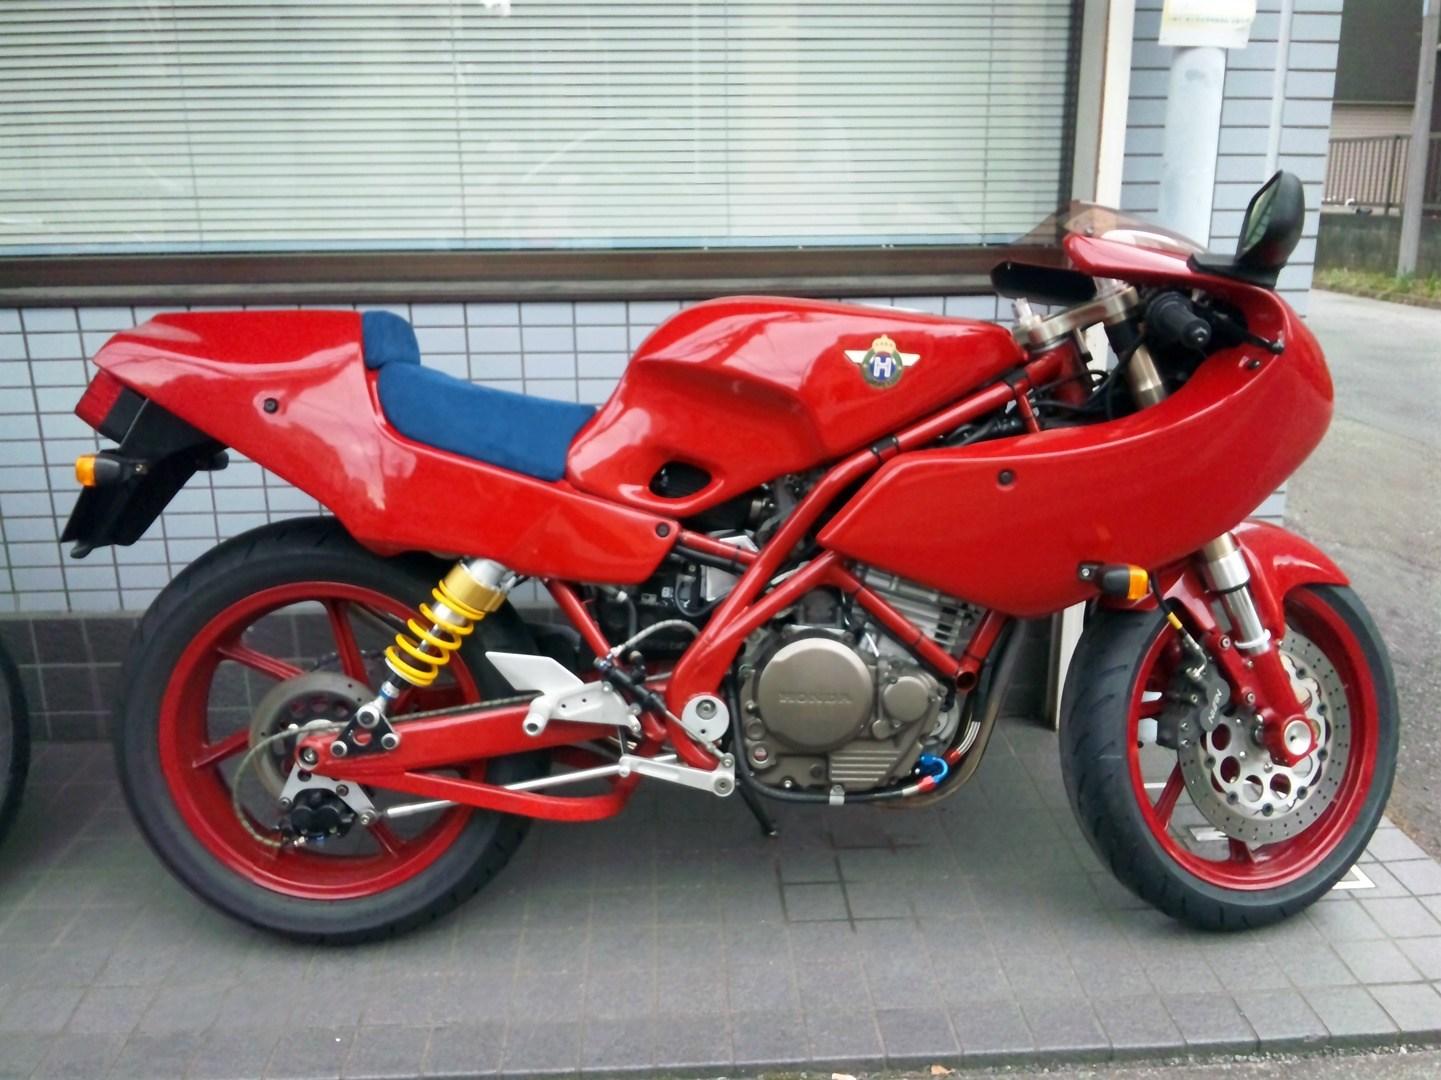 Moto del día: Mondial Piega 1000 | espíritu RACER moto